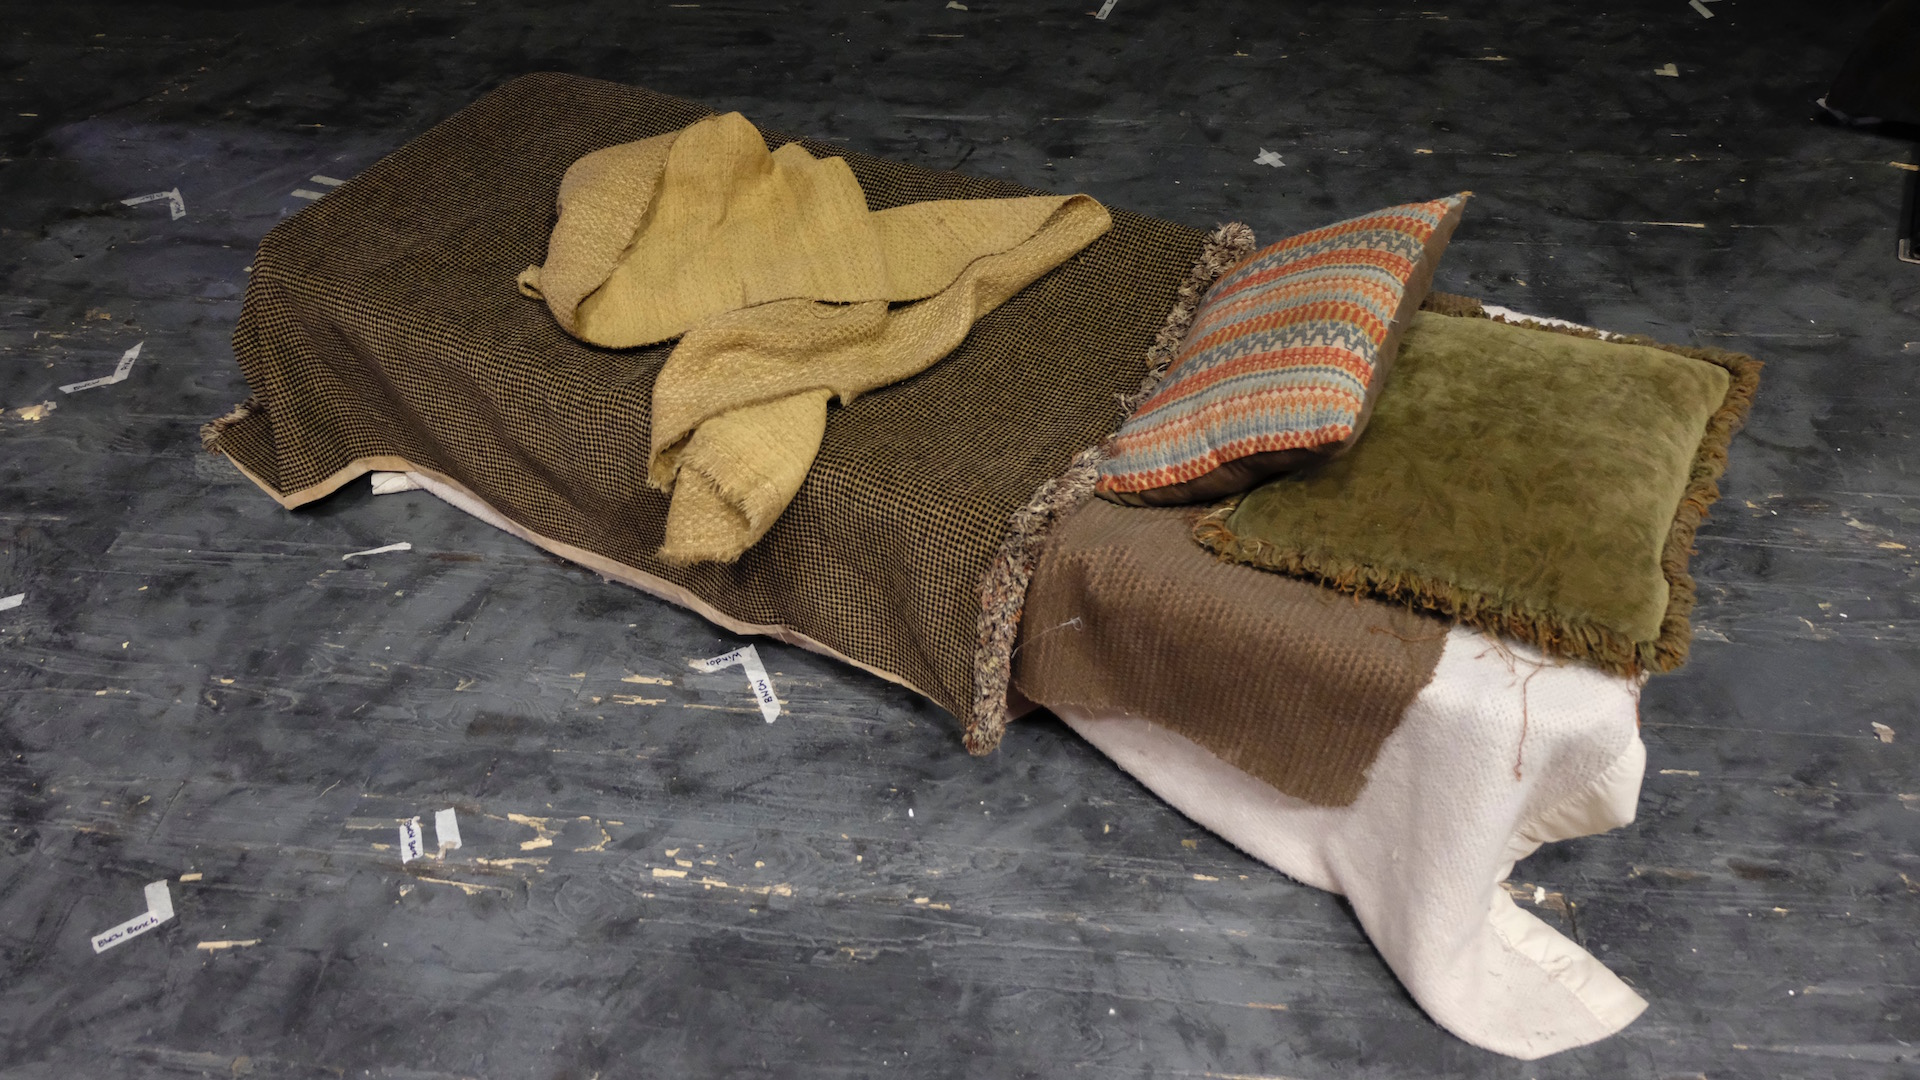 Cot Bed, Fallon's